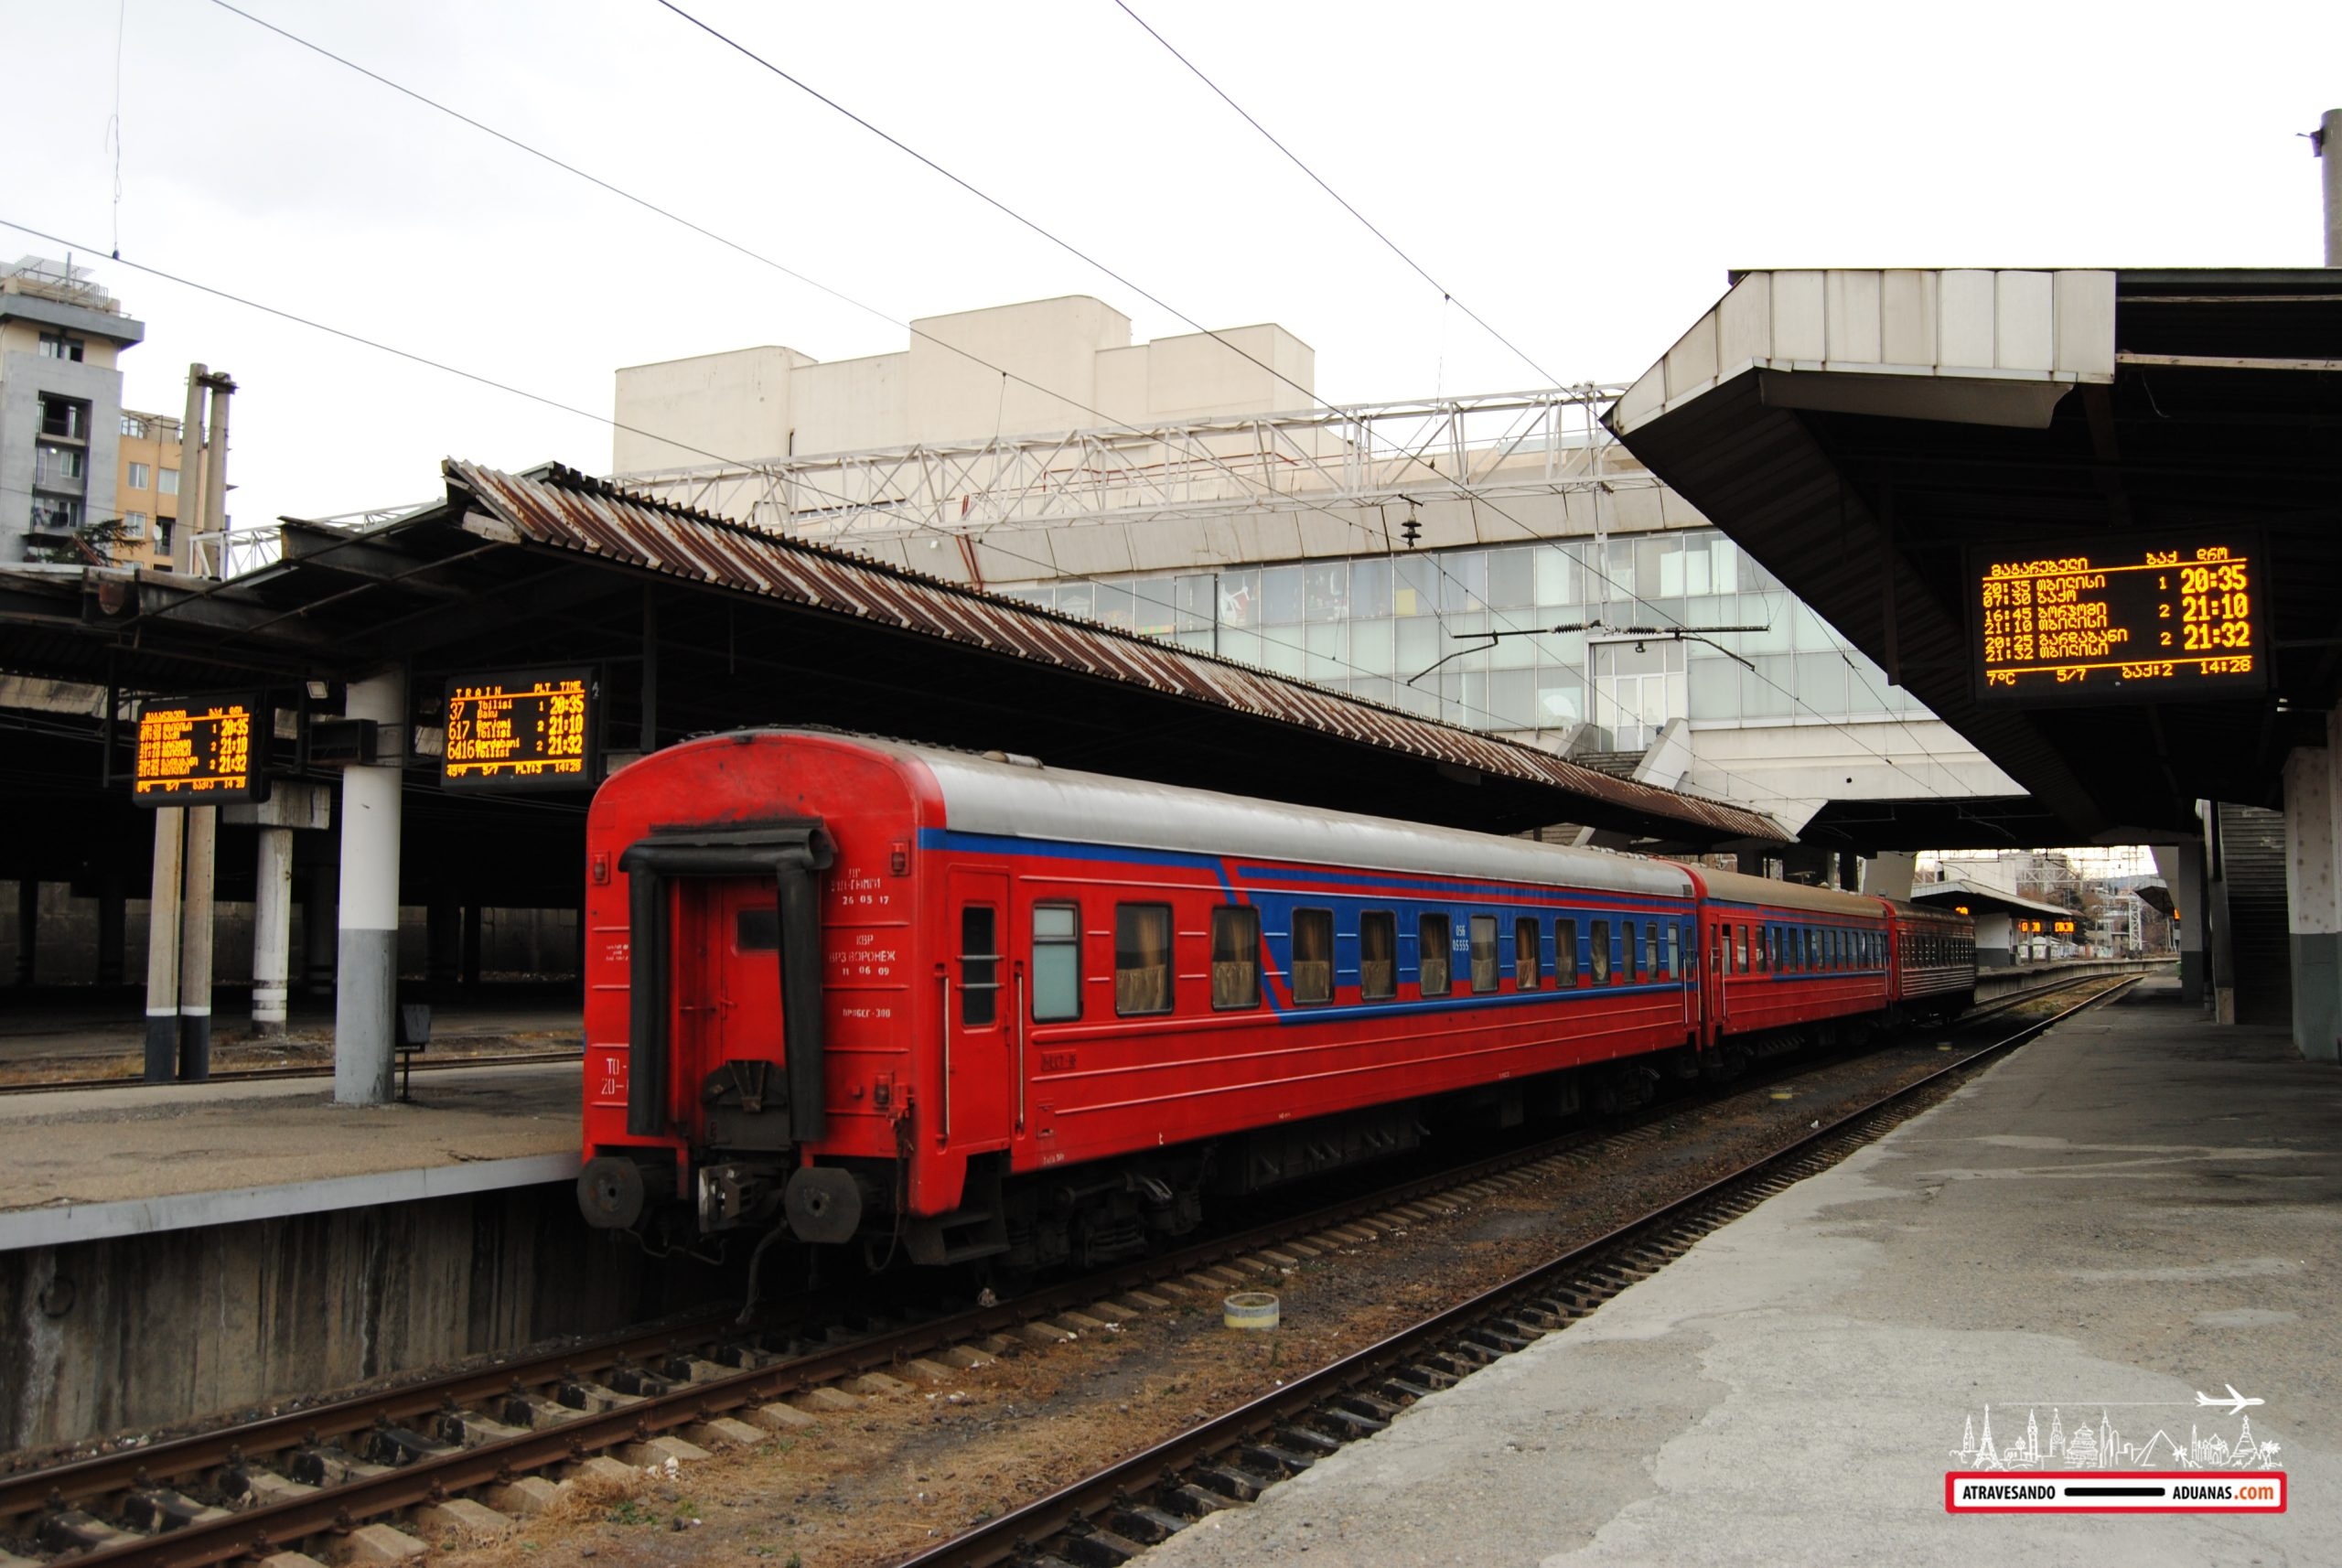 tren tbilisi-ereván en la estación de tren de tbilisi